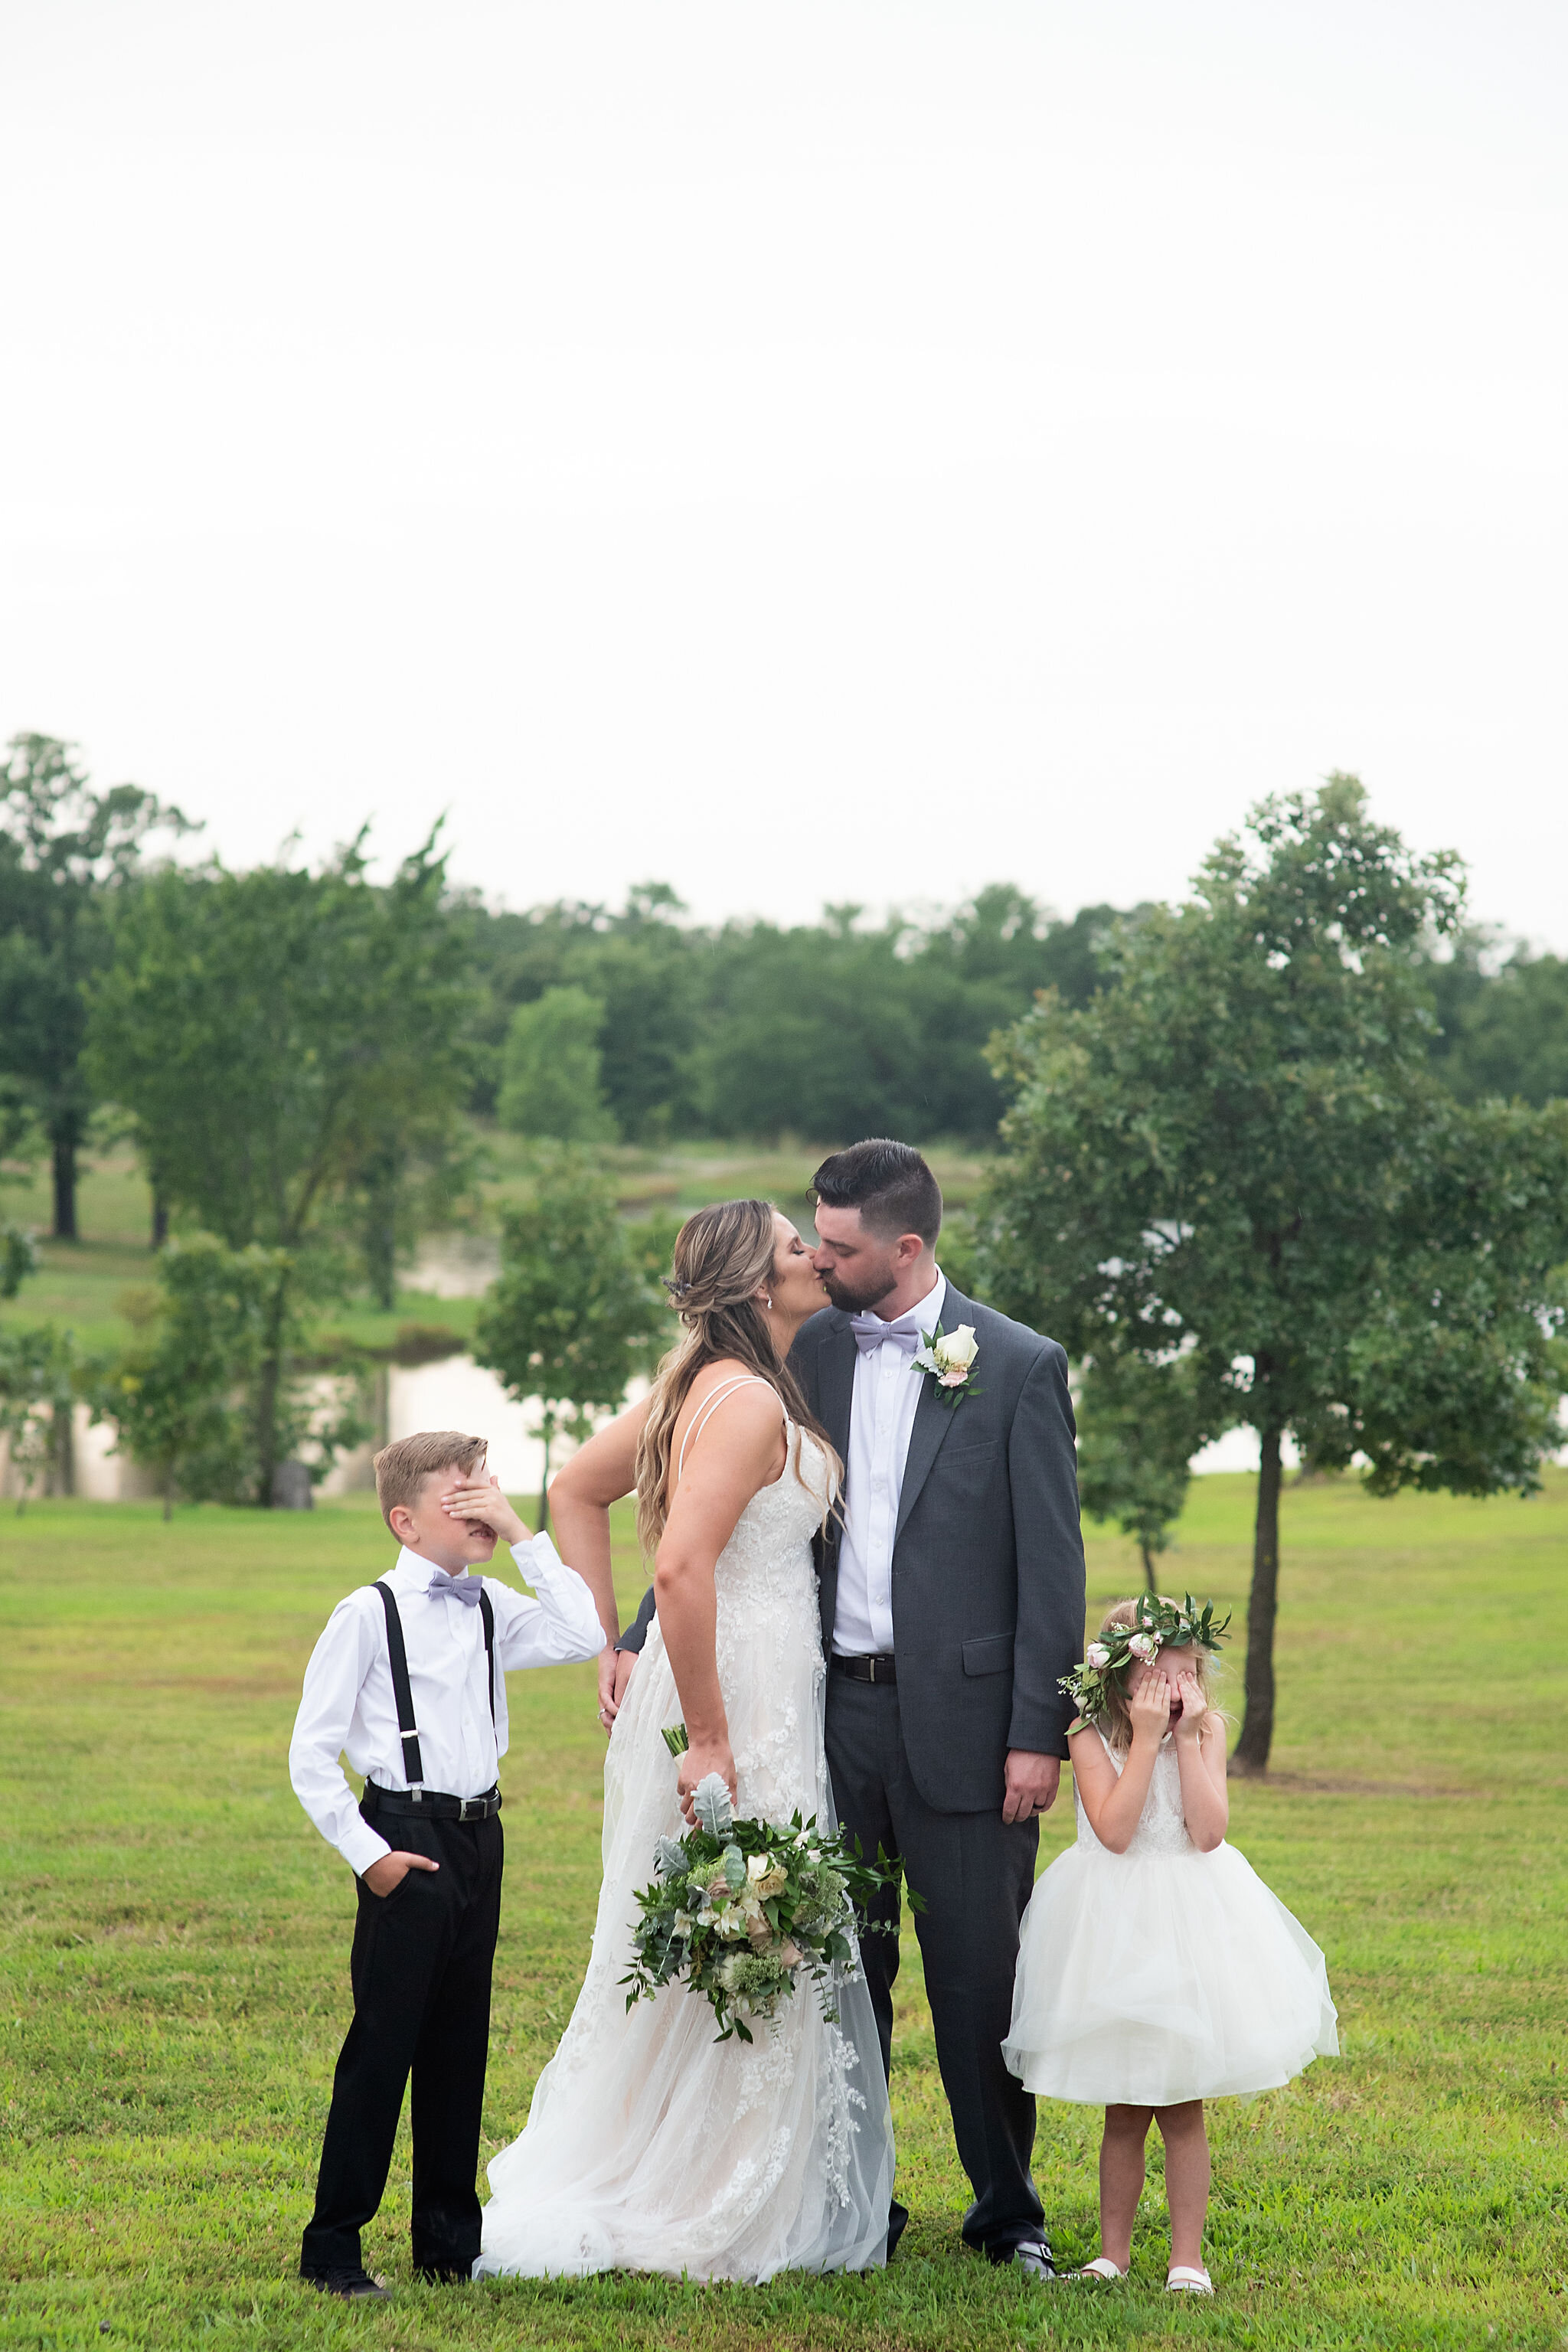 Oklahoma Summer Wedding Venue Dream Point Ranch 38.jpg